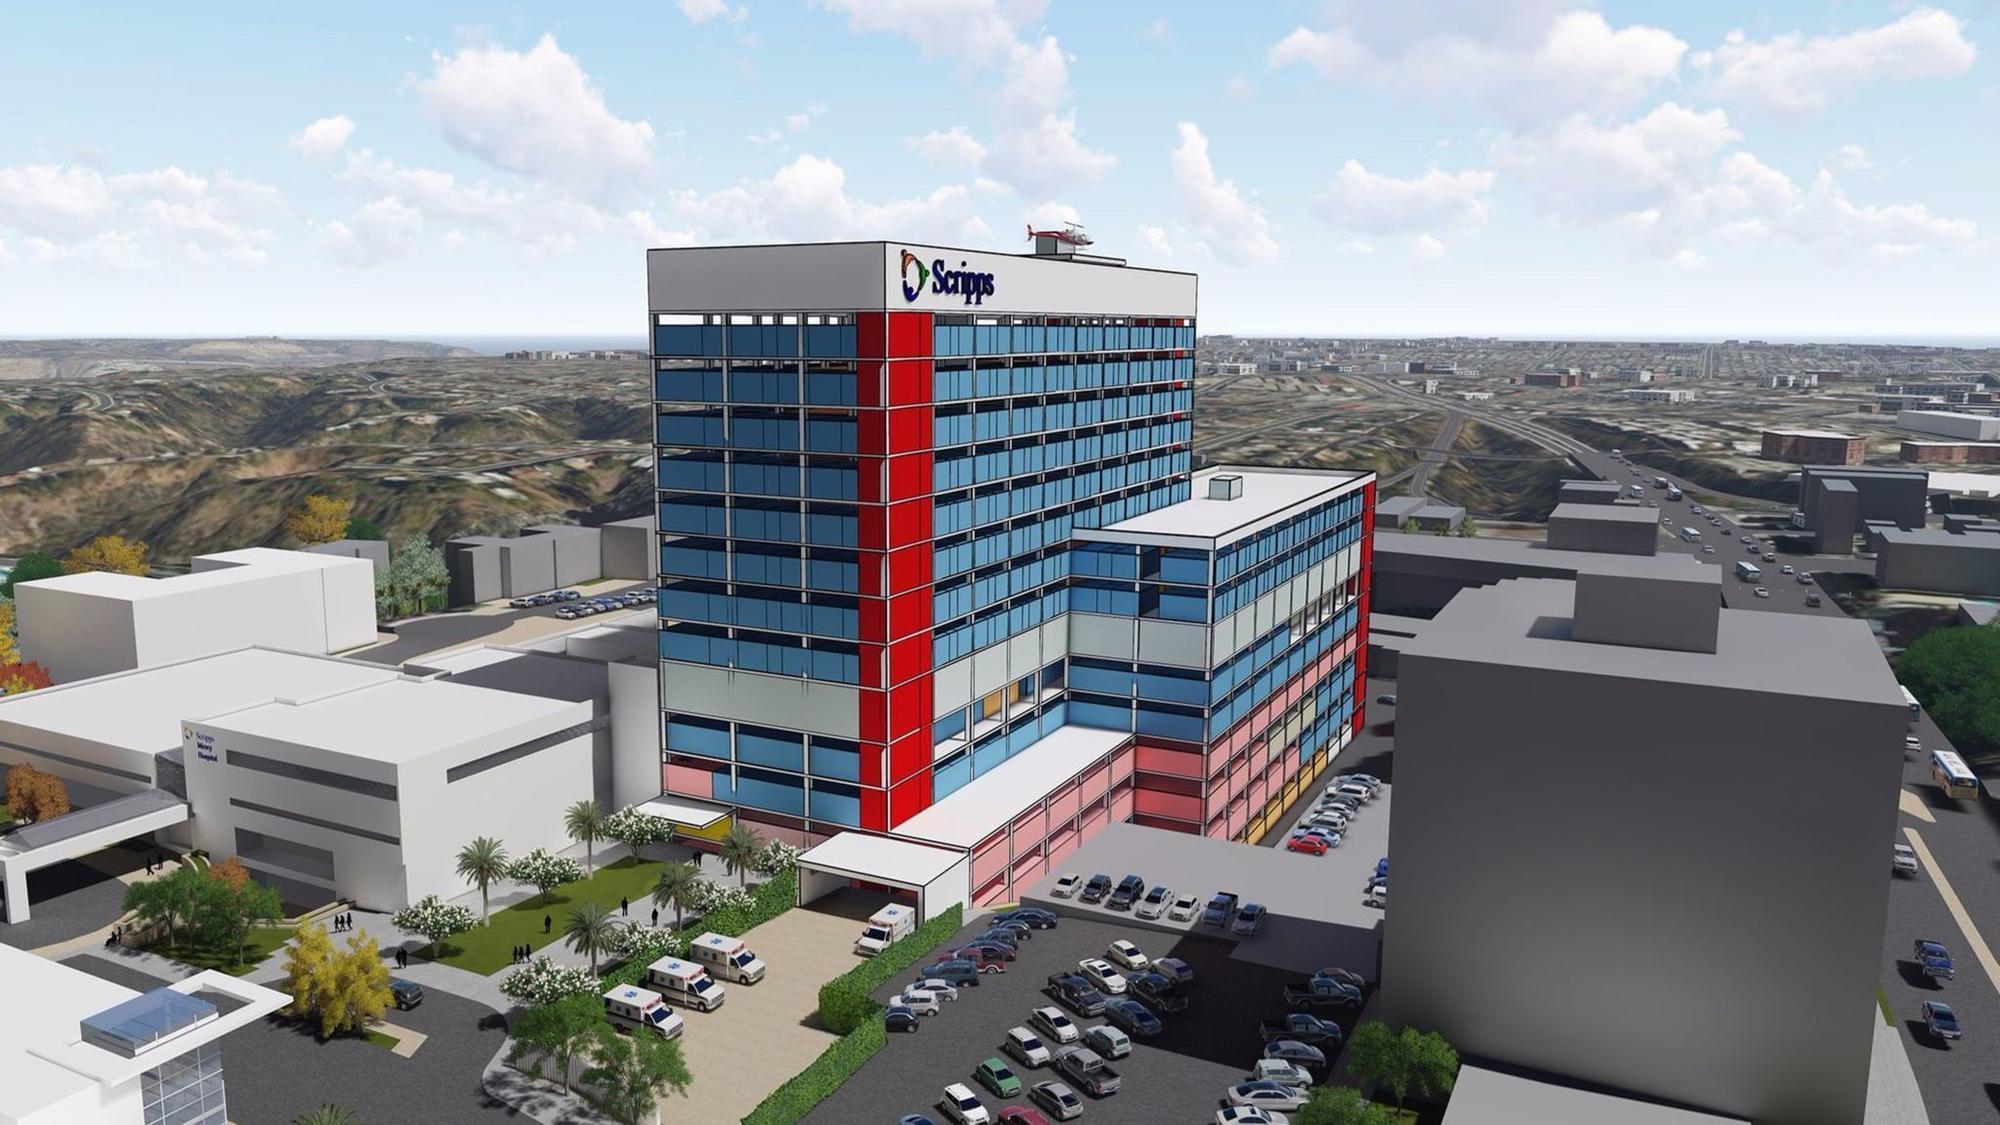 Scripps launches $2.6 billion building plan - The San Diego Union ...